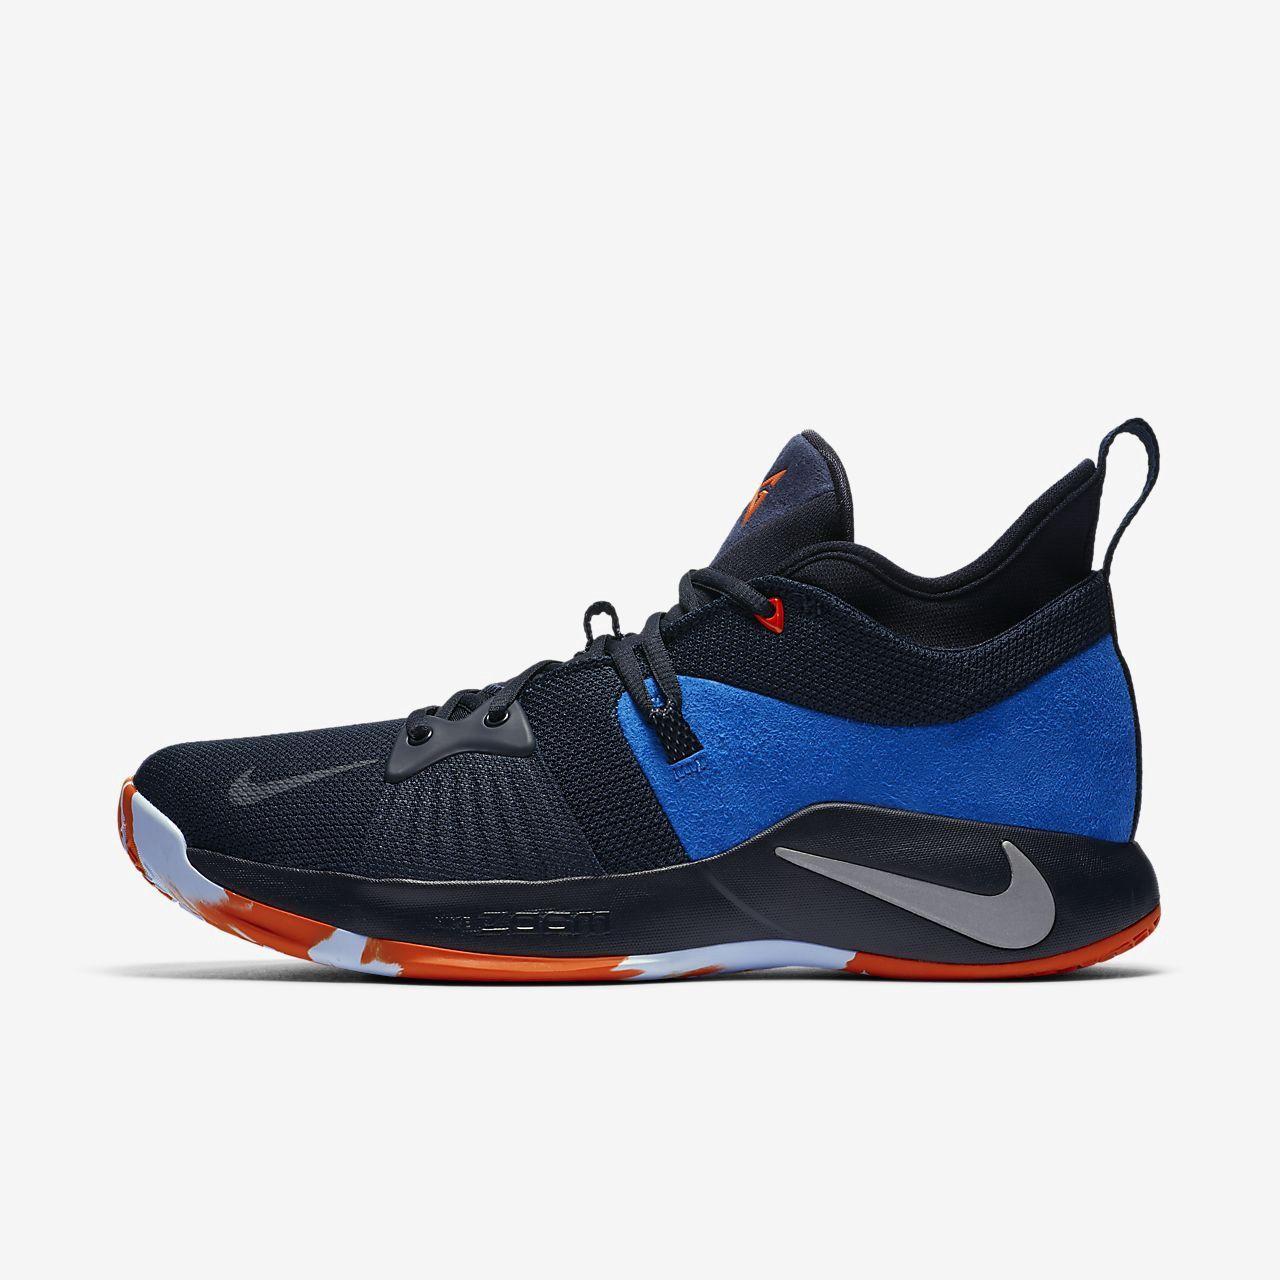 776e88c512b8 Nike Pg 2 Basketball Shoe - M 13   W 14.5